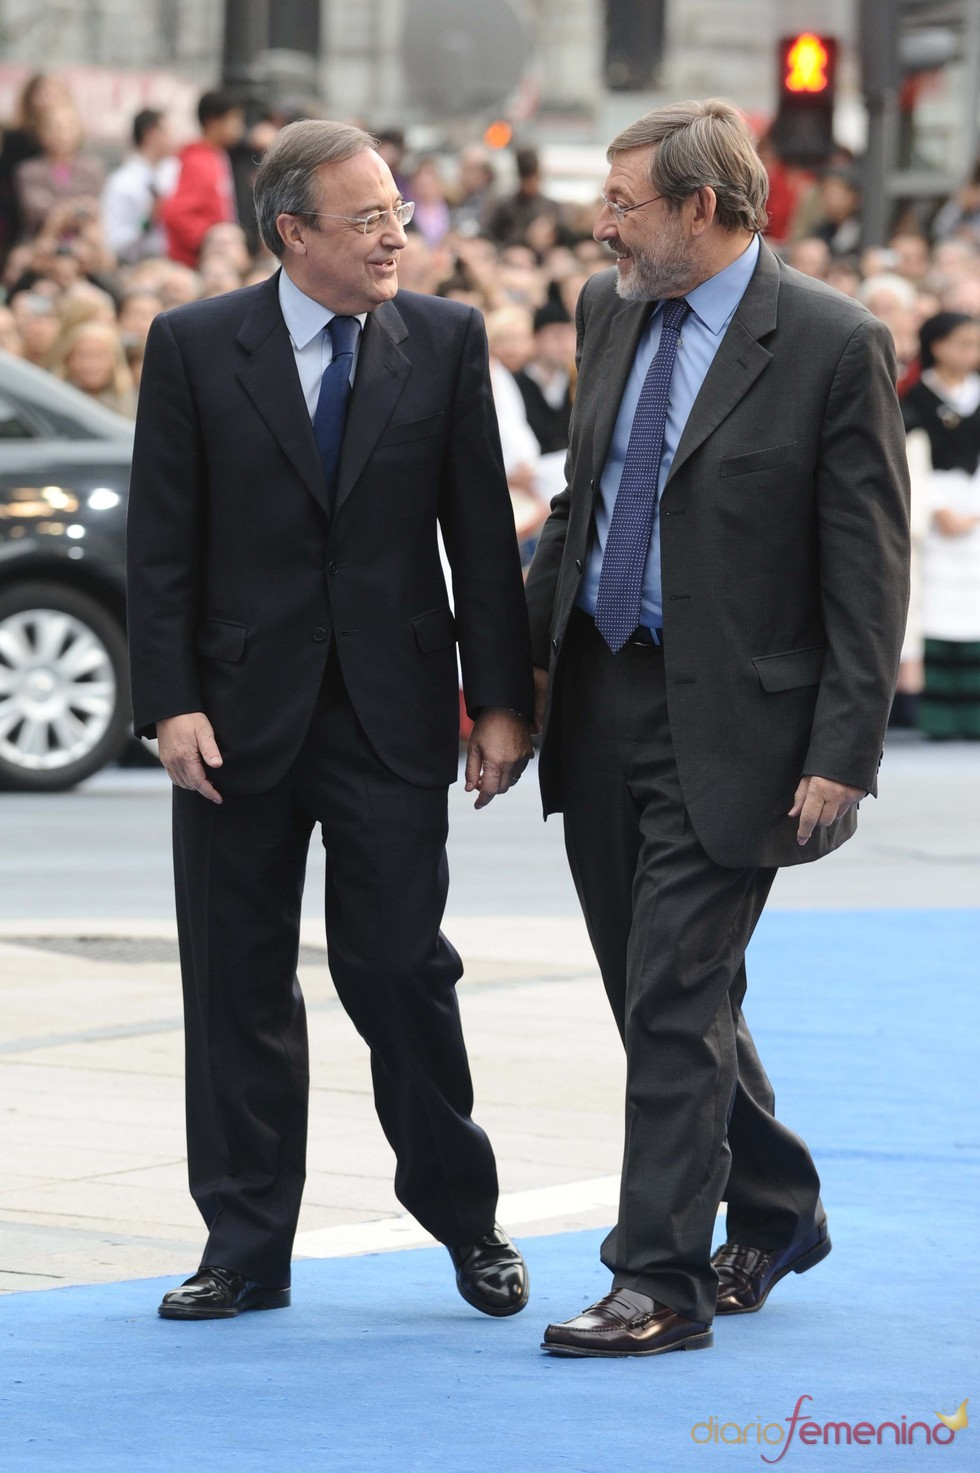 Florentino Pérez y Jaime Lissavetzky en los premios Príncipe de Asturias 2010